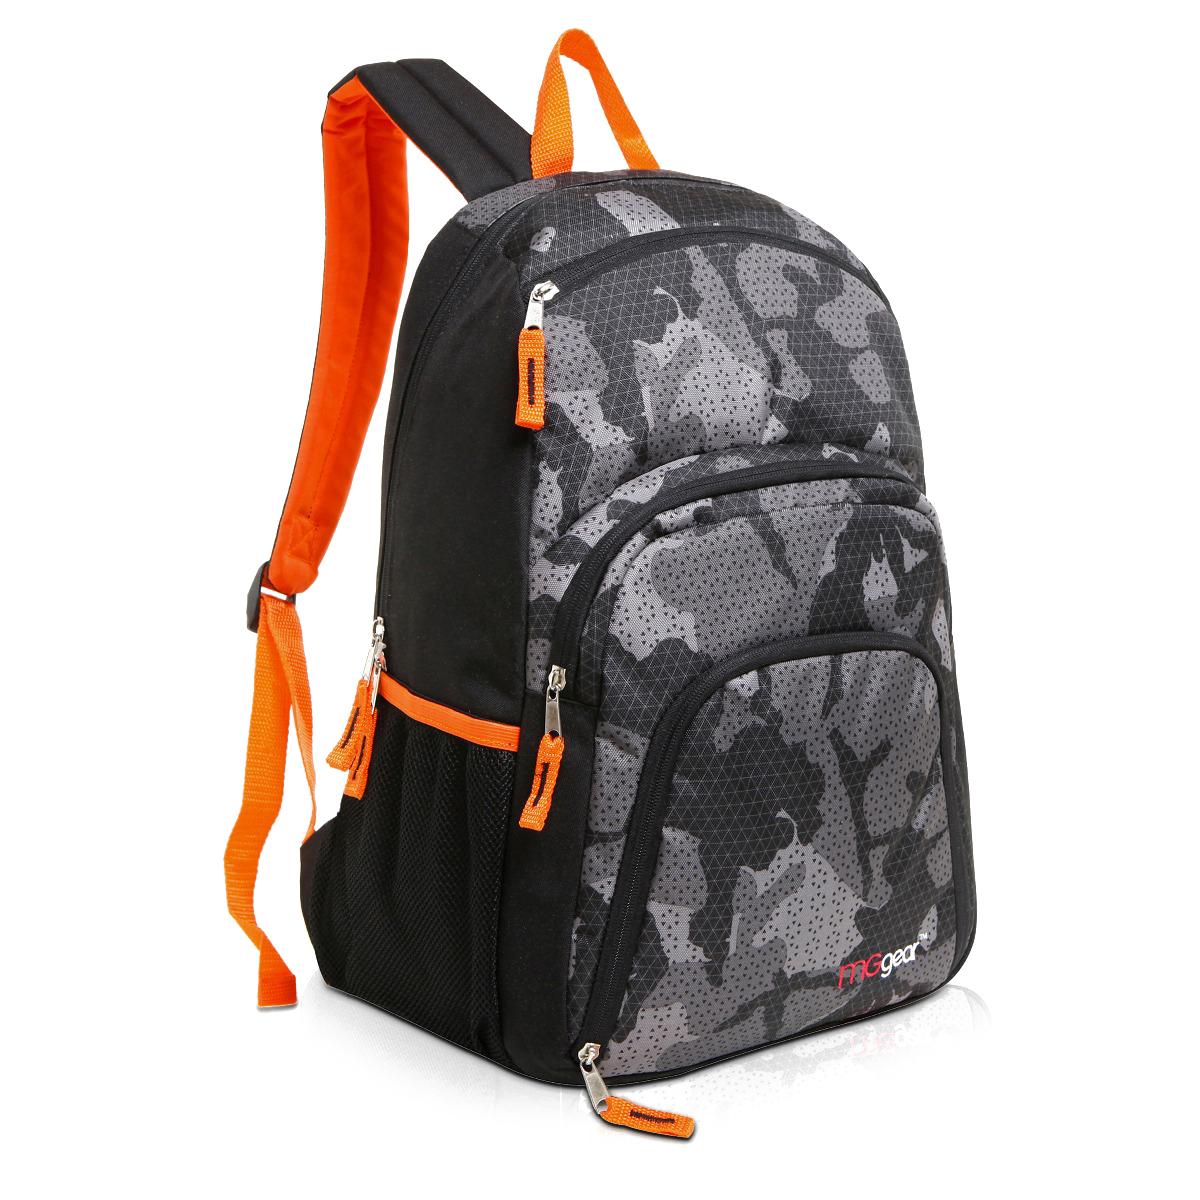 MGgear 18 inch Gray Urban Camouflage School Backpacks in Bulk